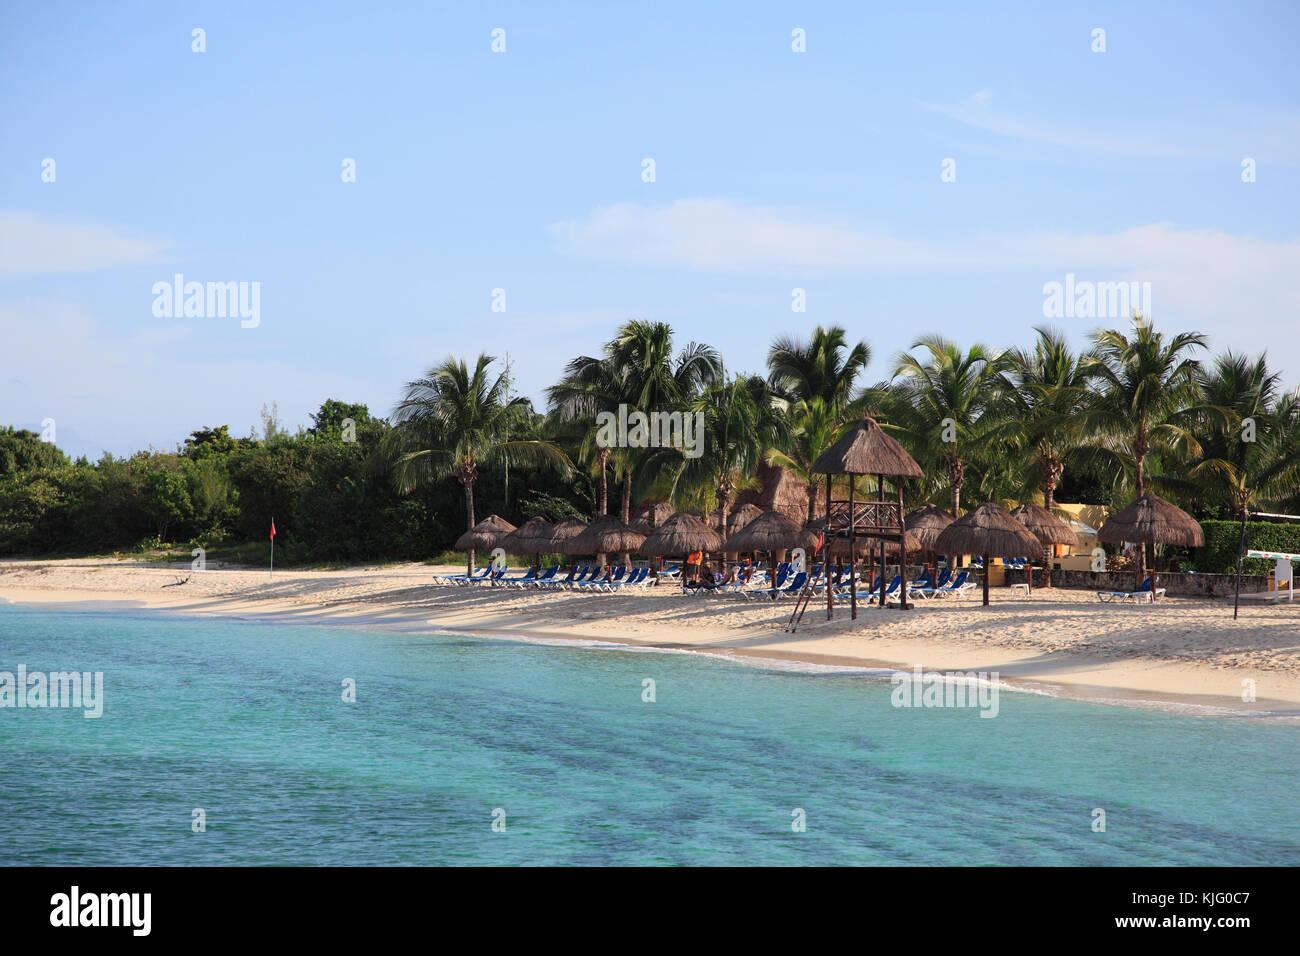 https www alamy com stock image san francisco beach caribbean ocean cozumel island isla de cozumel 166308695 html